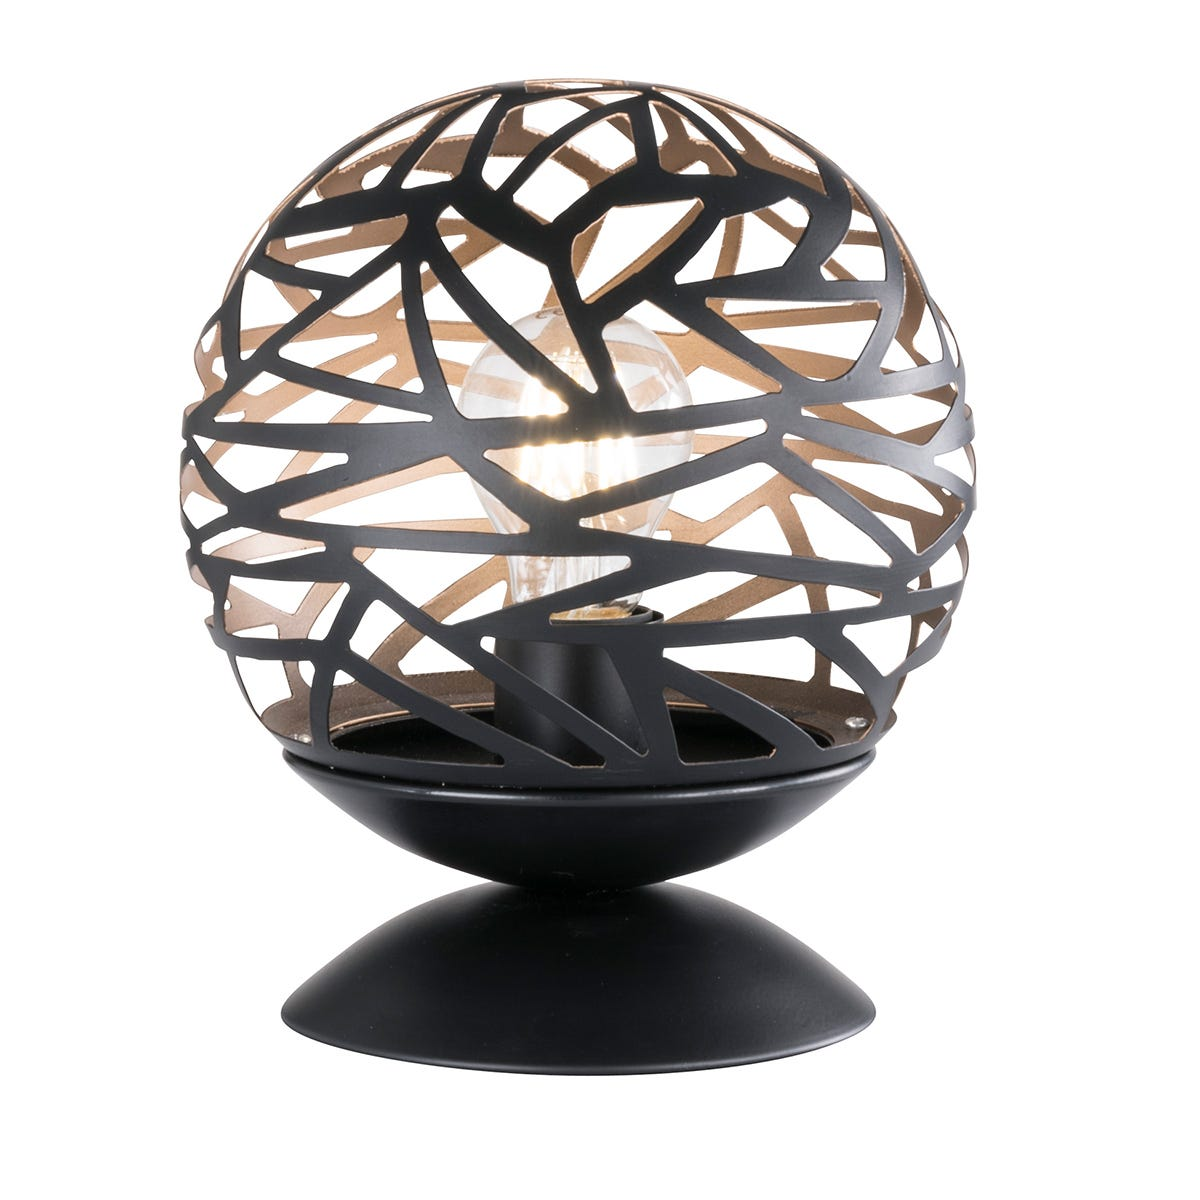 Wofi Rachel Table Lamp - Black/Gold